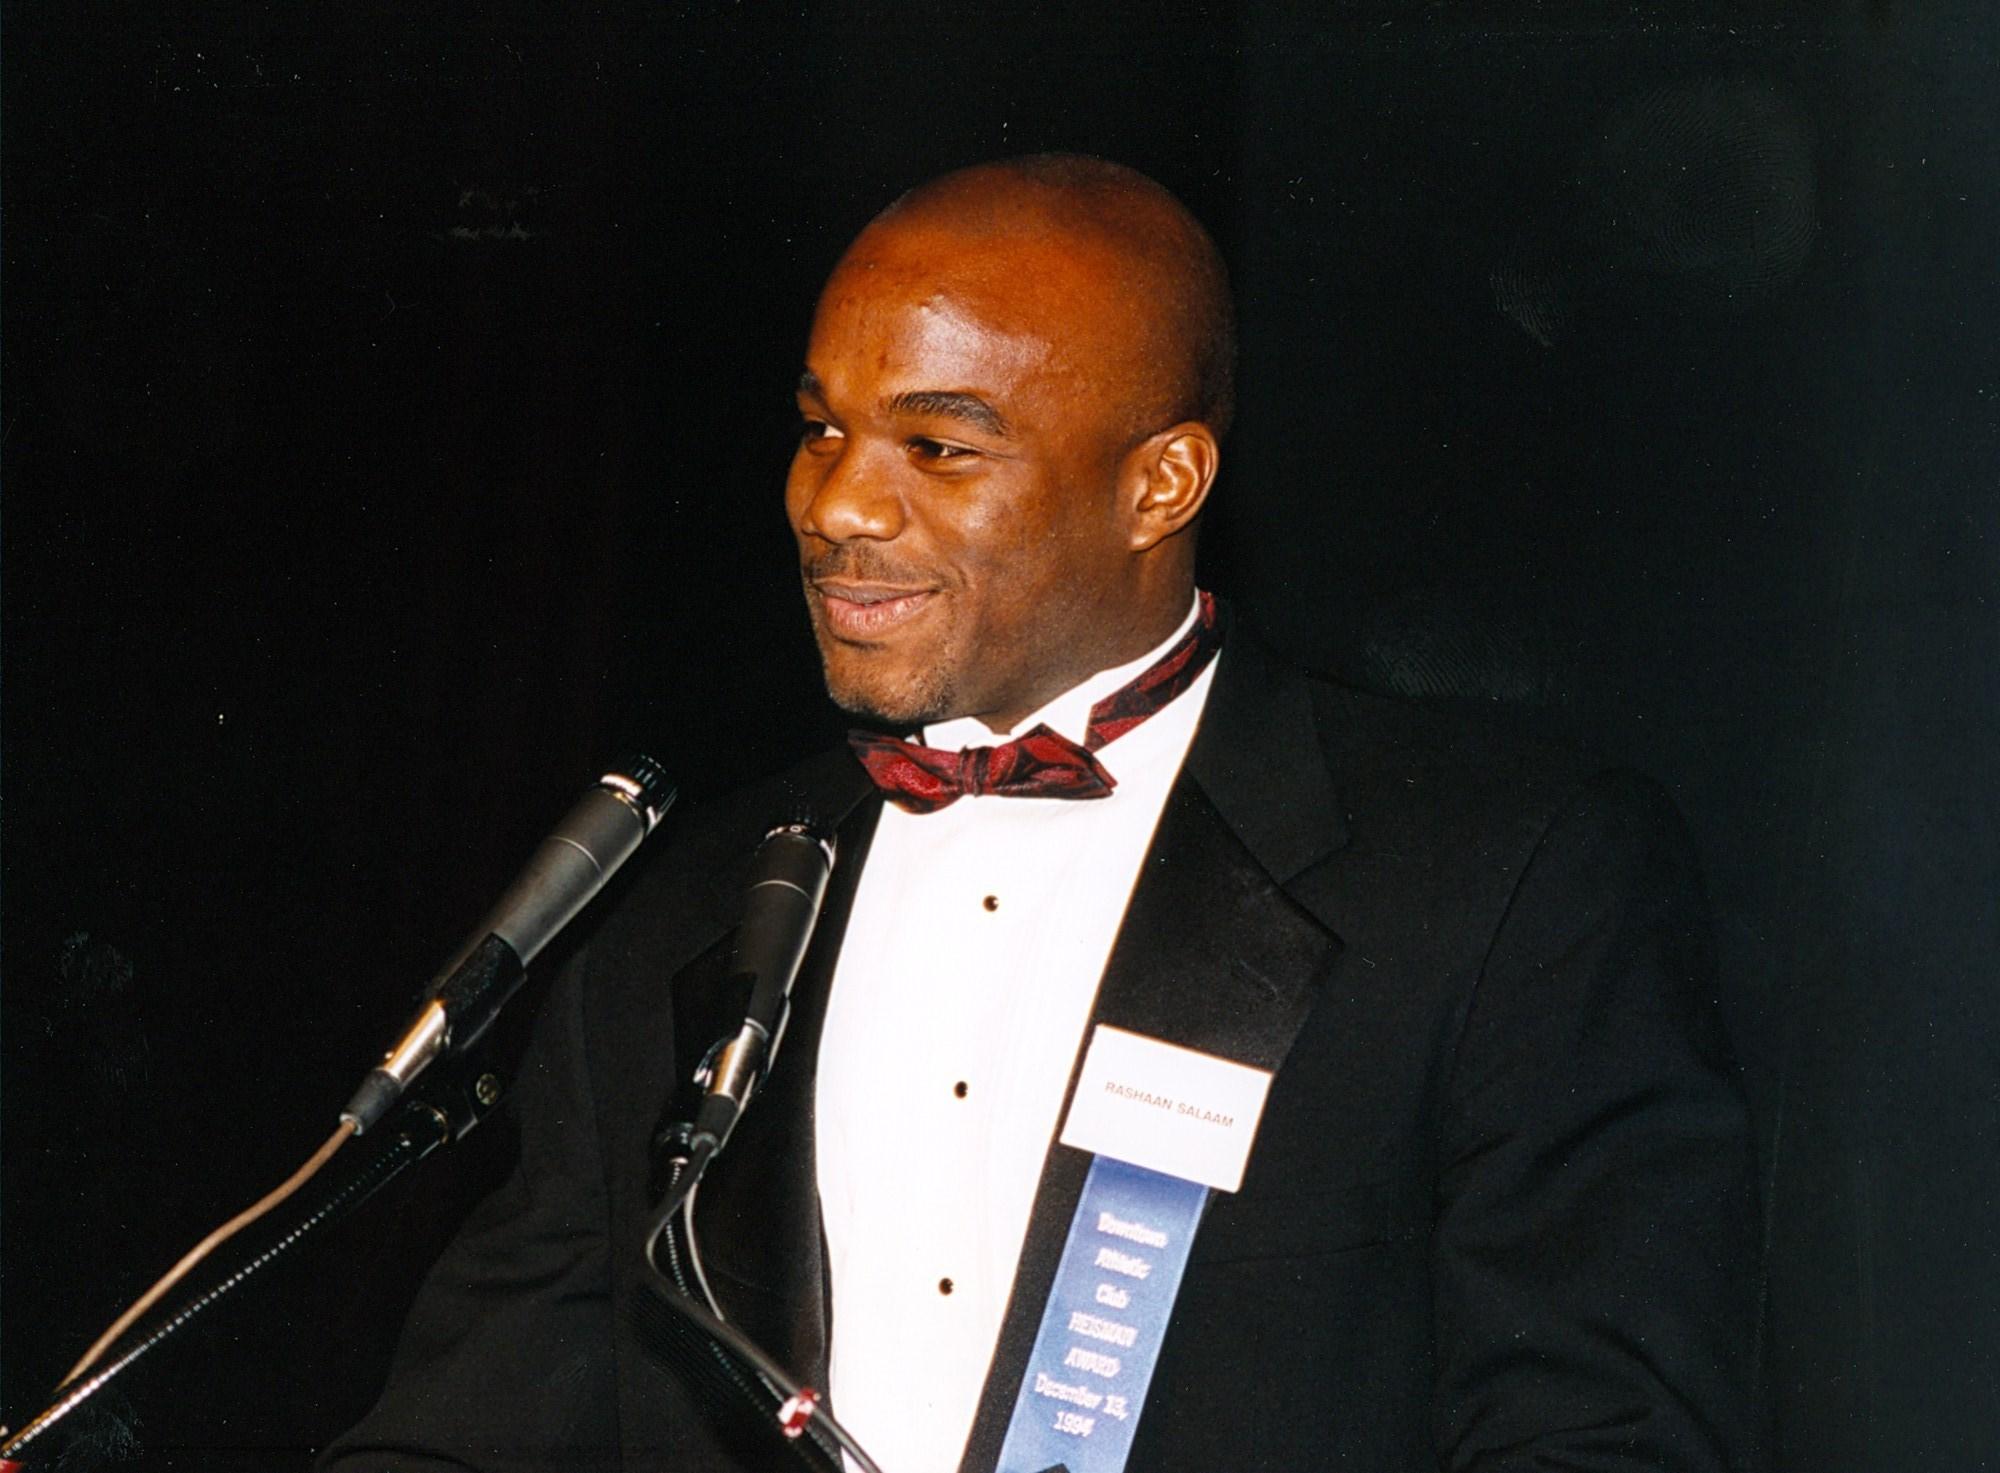 Rashaan Salaam 1994 Heisman Trophy Winner